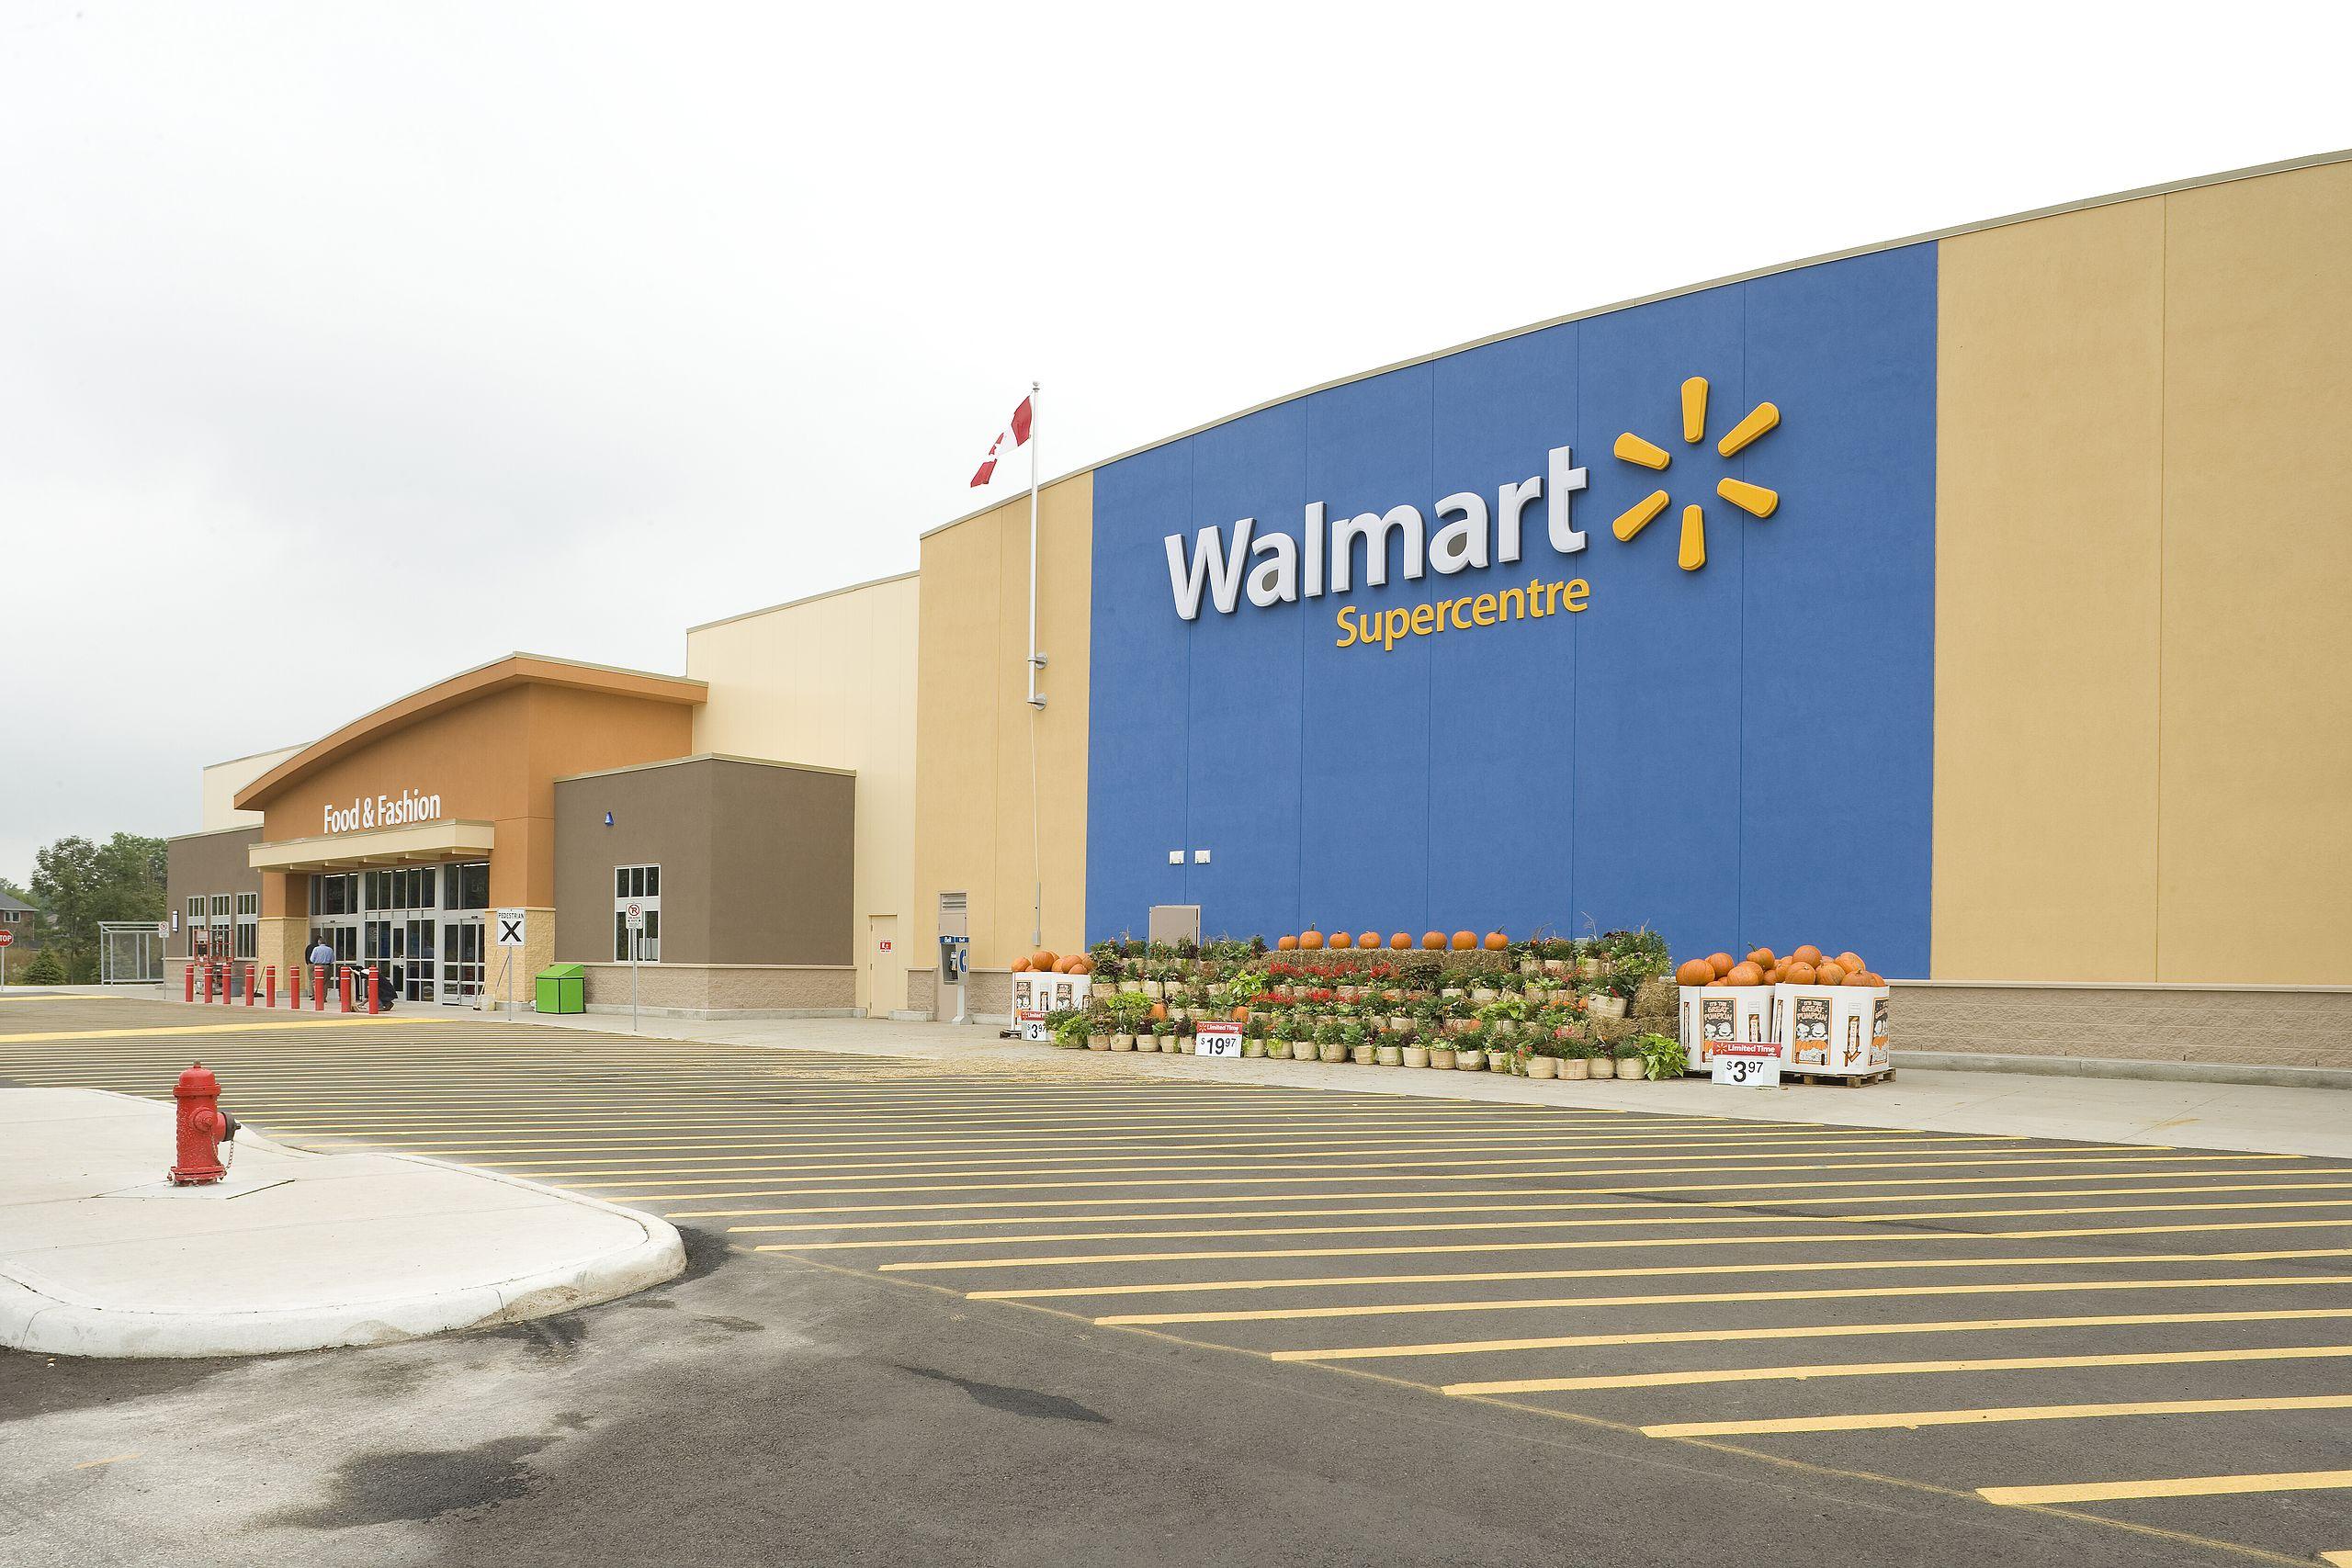 Difference Between Walmart and Walmart Supercenter